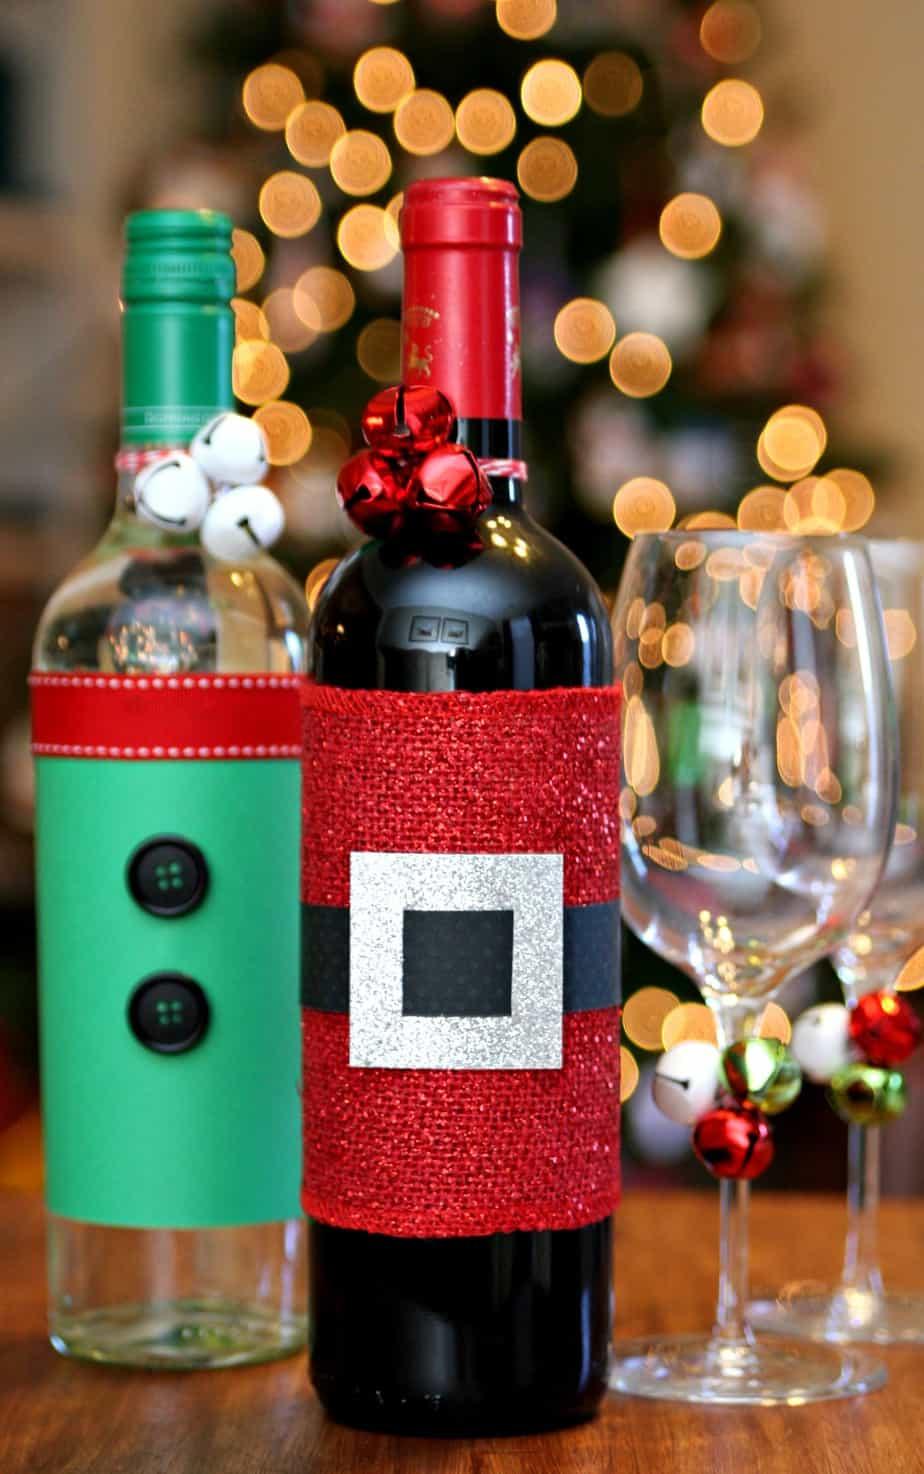 Festive Wine Bottles - Set up a Wine Station